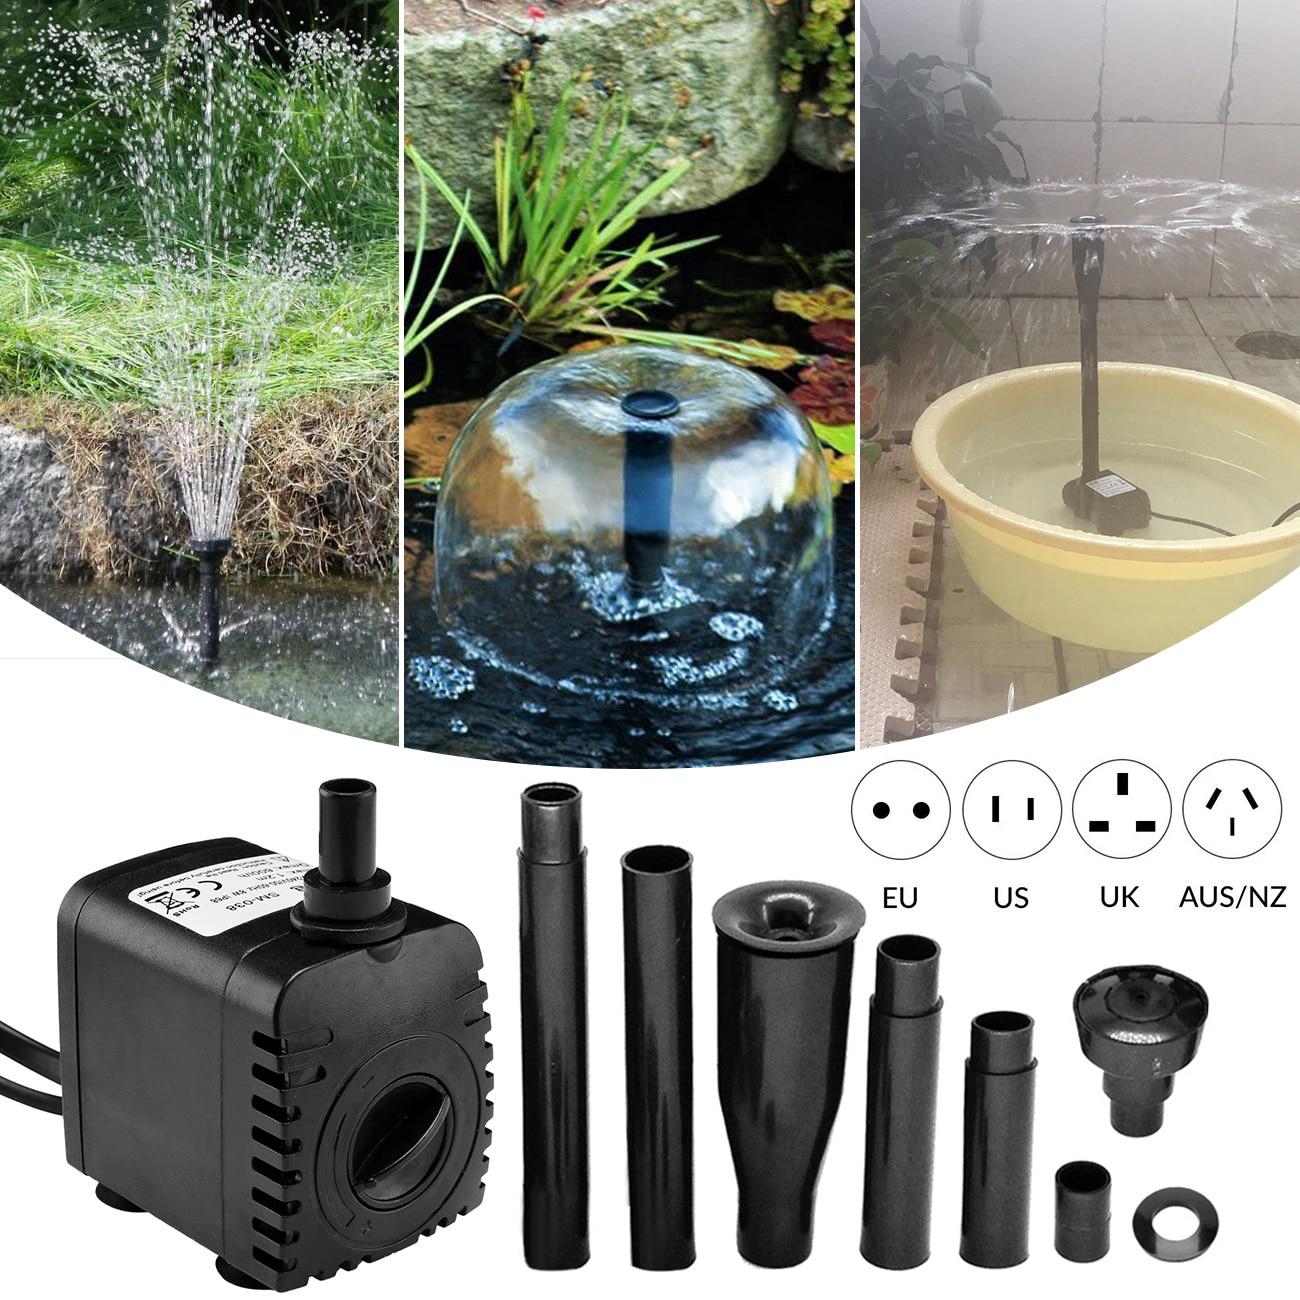 Submersible-Pump Fountain-Pump Aquariums Garden D30 Rockery No-Lamp